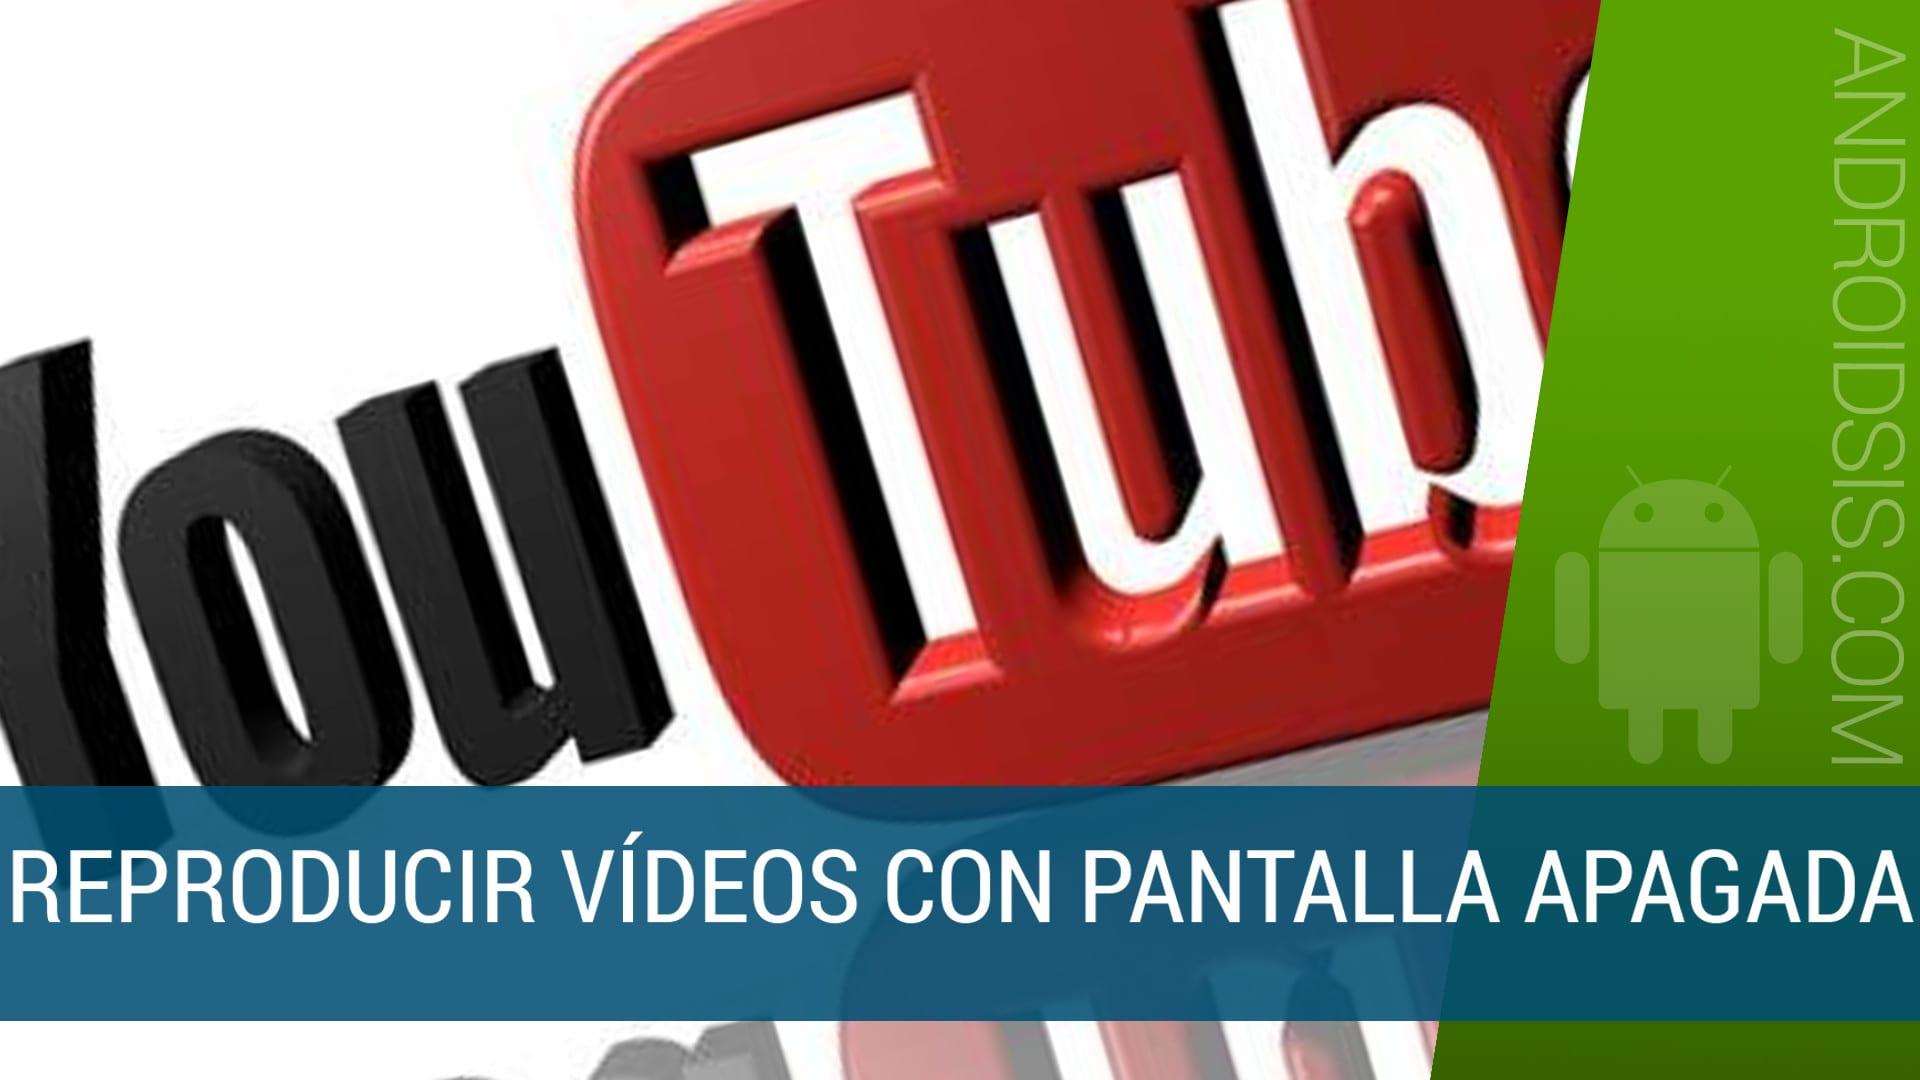 Cómo reproducir vídeos de You Tube con la pantalla apagada